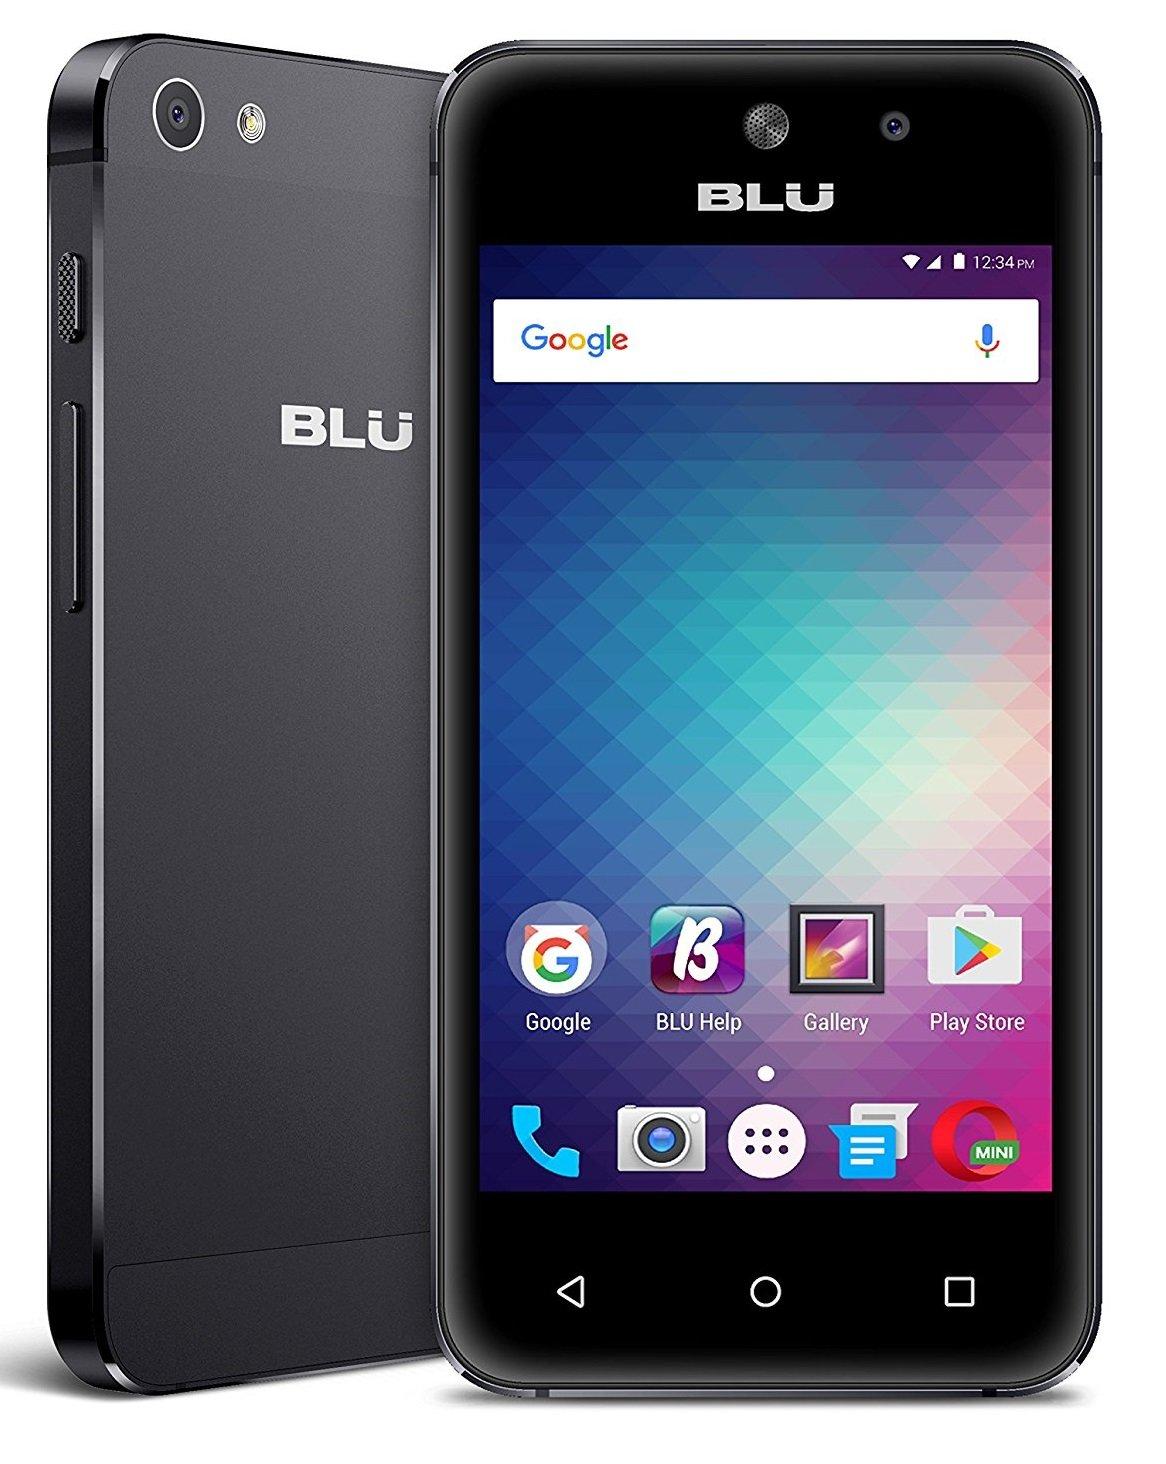 BLU Vivo 5 Mini 4'' IPS LCD Touchscreen Display, 8GB Quad-Core Android 6.0 Smartphone w/ 5MP Rear + Front Camera - Black